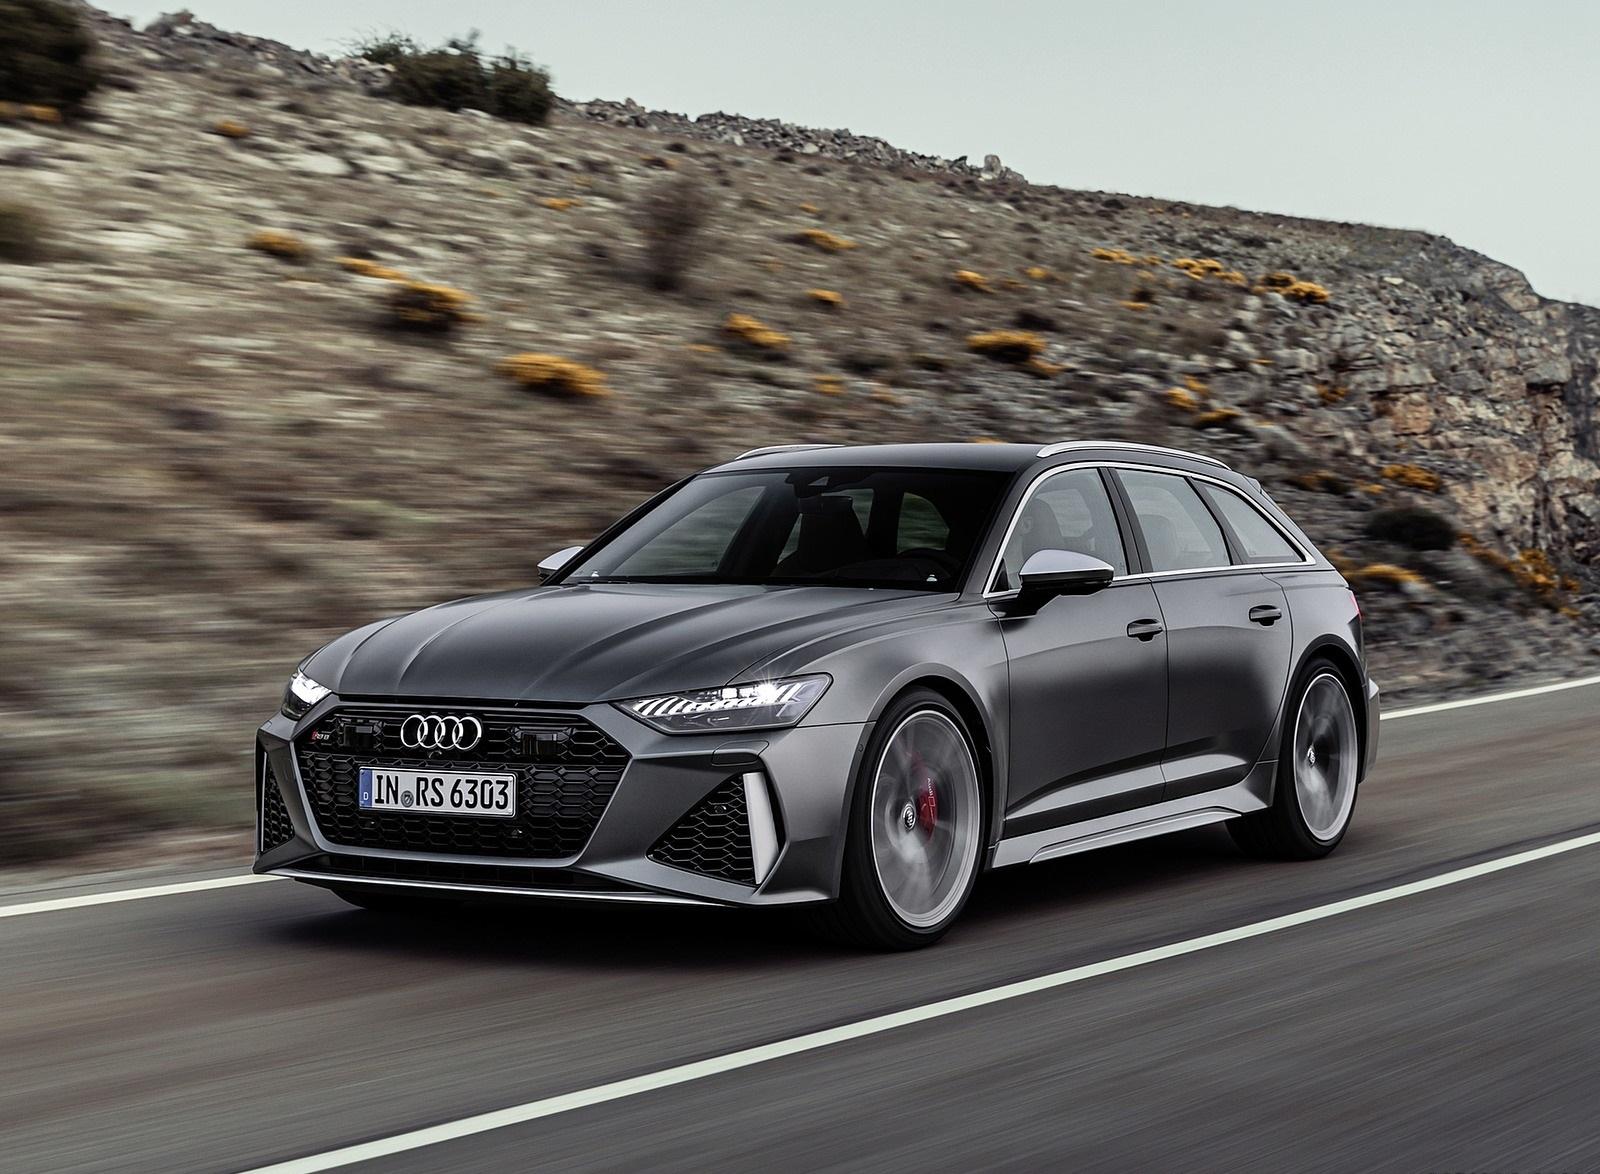 2020 Audi RS 6 Avant Front Three-Quarter Wallpapers (1)